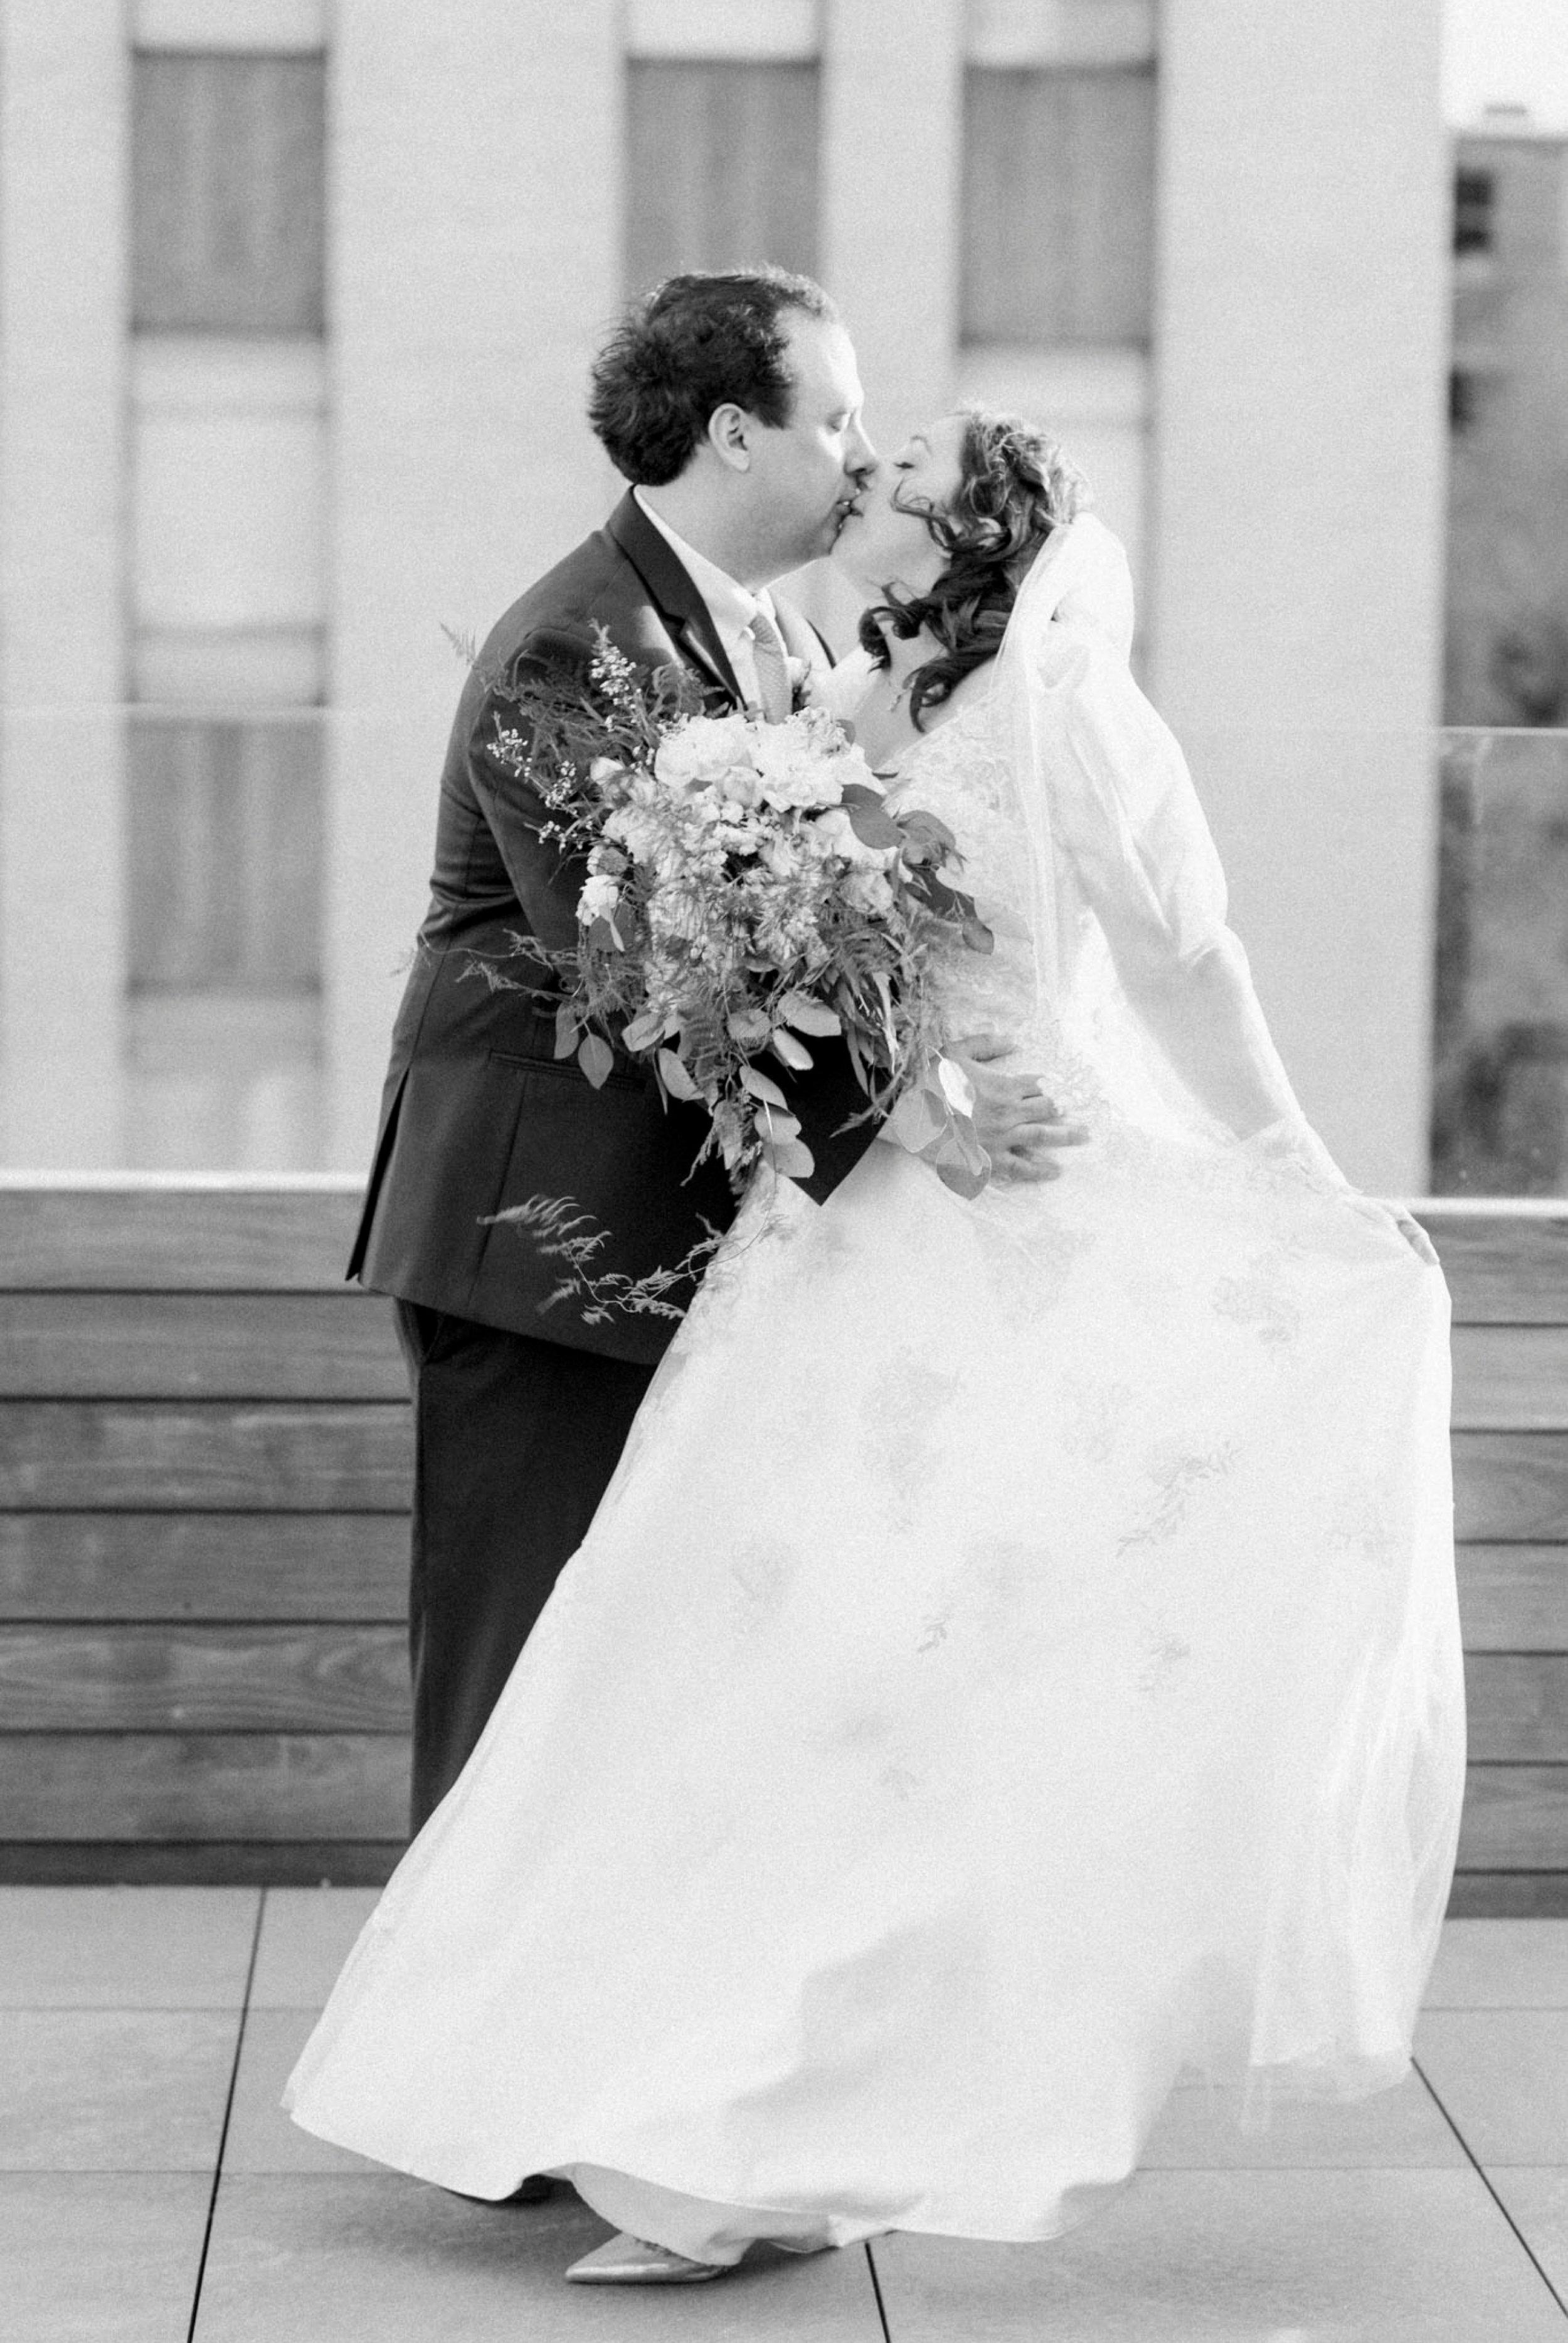 TheVirginianHotel_LynchburgVA_TheVirginianHotelWedding_Virginiaweddingphotographer_Lynchburgvawedding 46.jpg